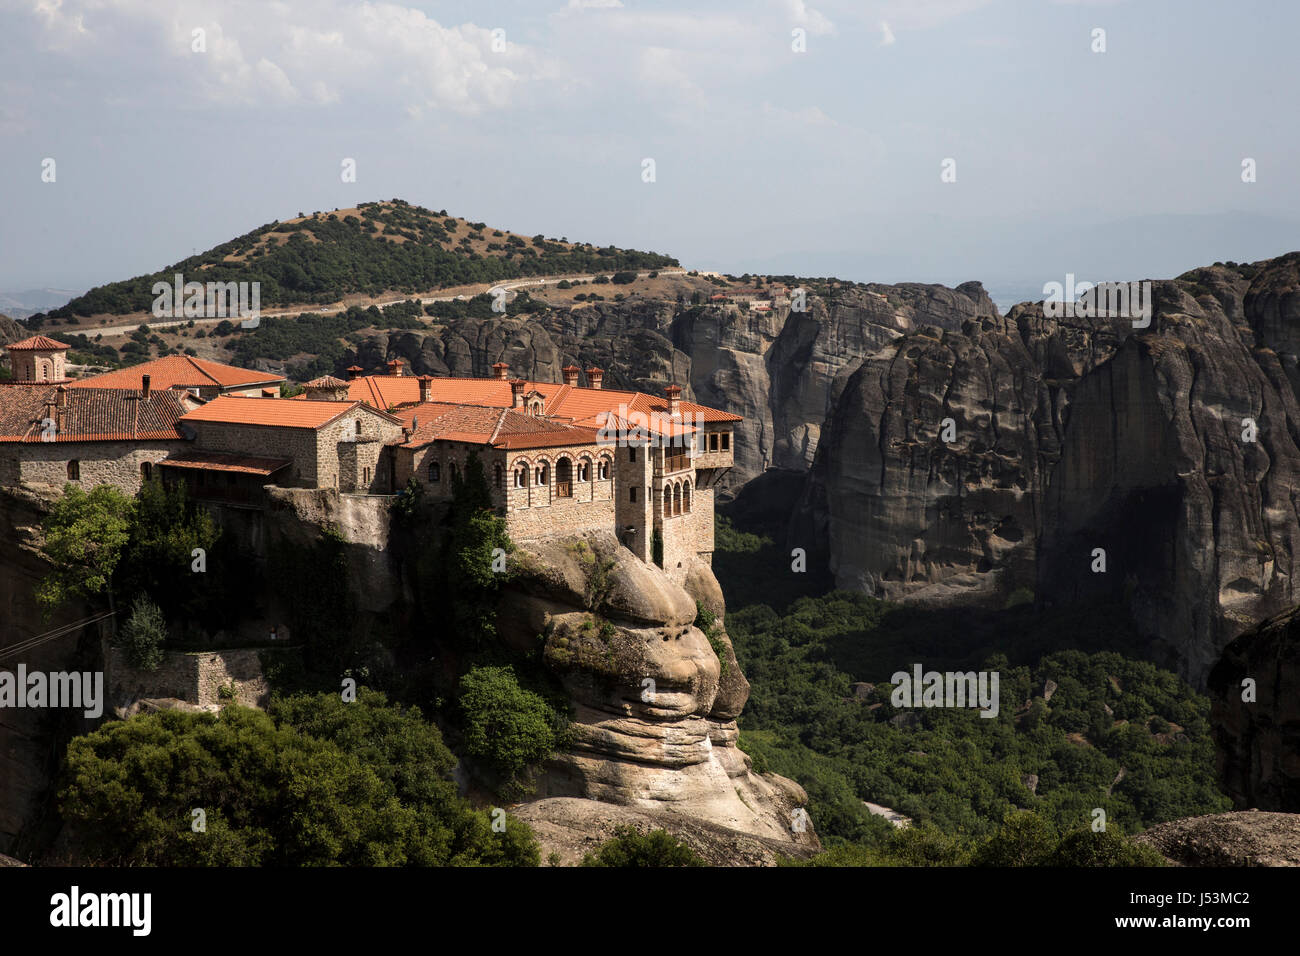 The Monastery of Varlaam, Meteora, Kalabaka, Greece on July 15, 2016. - Stock Image